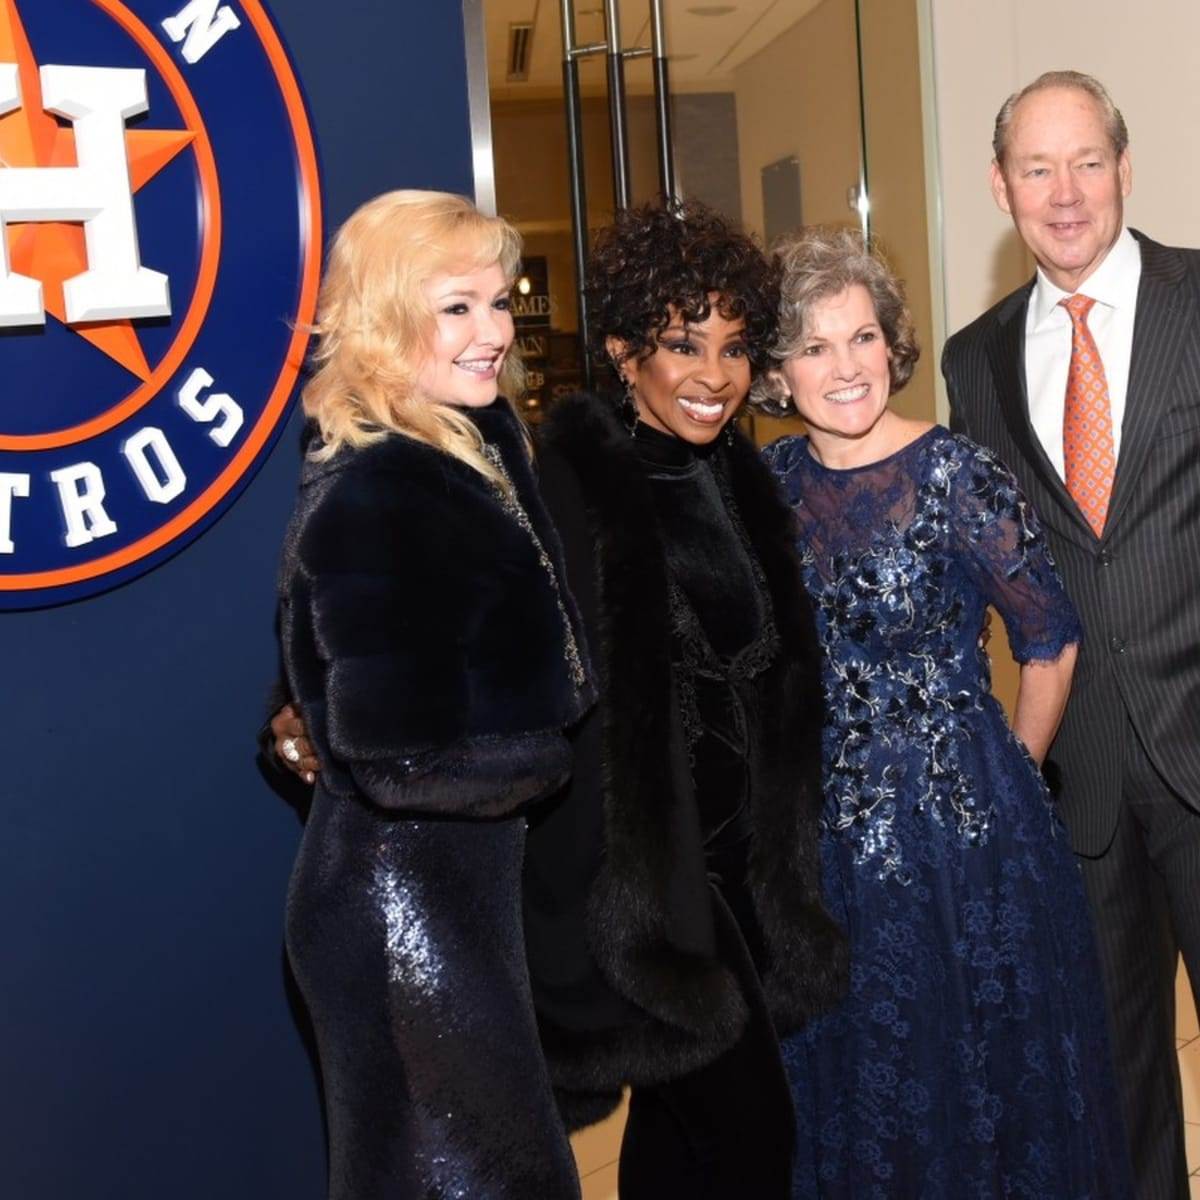 Houston, Diamond Dreams Astros Gala, January 2018, Whitney Crane, Gladys Knight, Twila Carter, Jim Crane